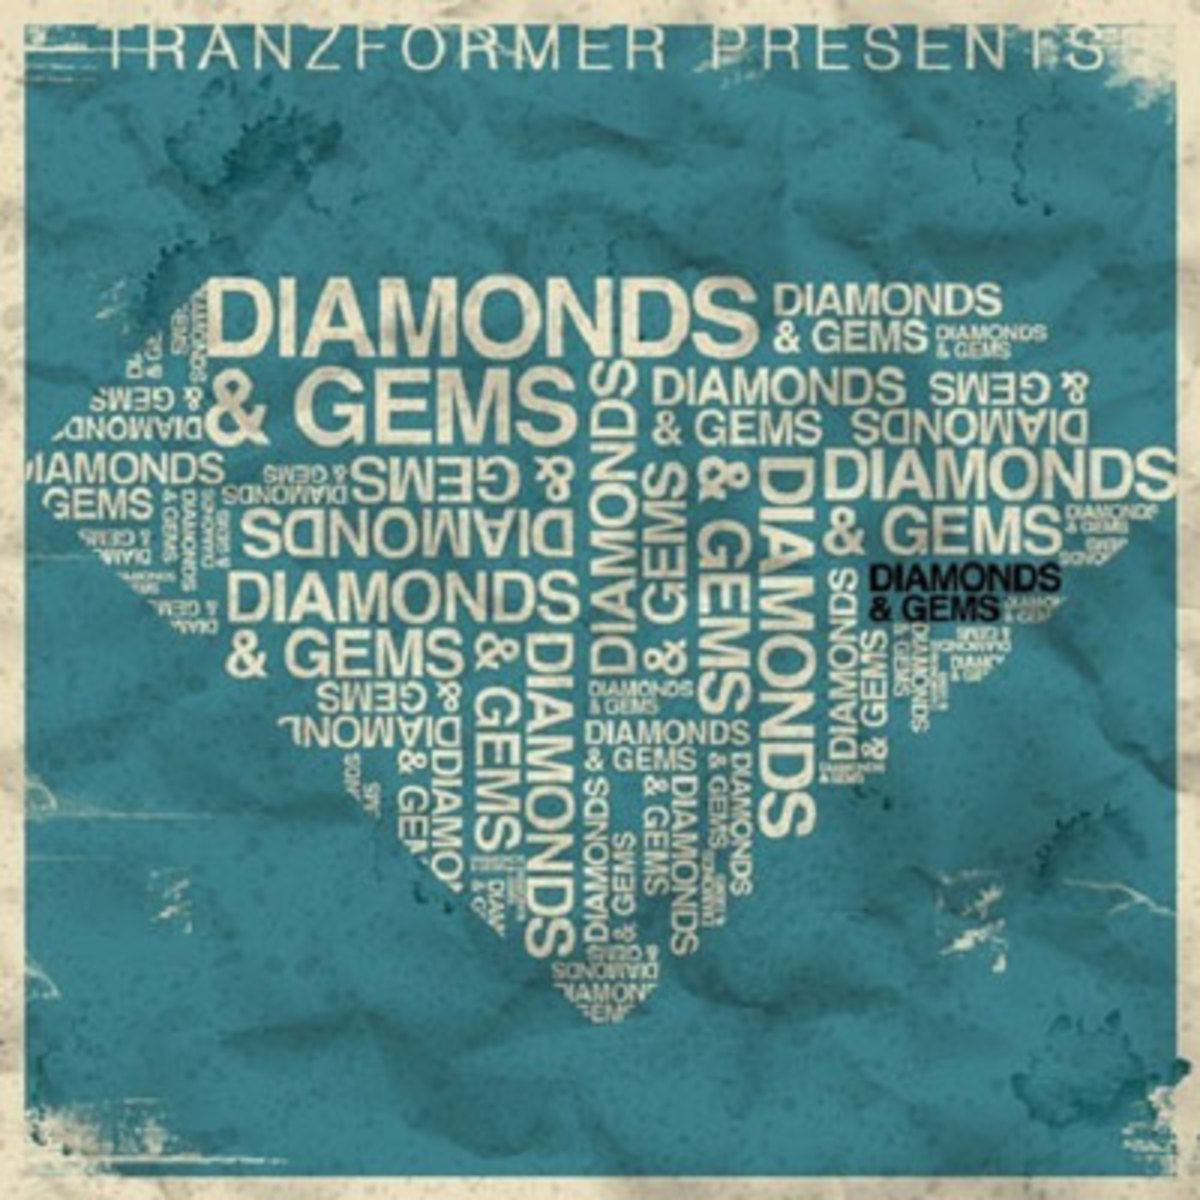 tranzformer-diamondsgems.jpg